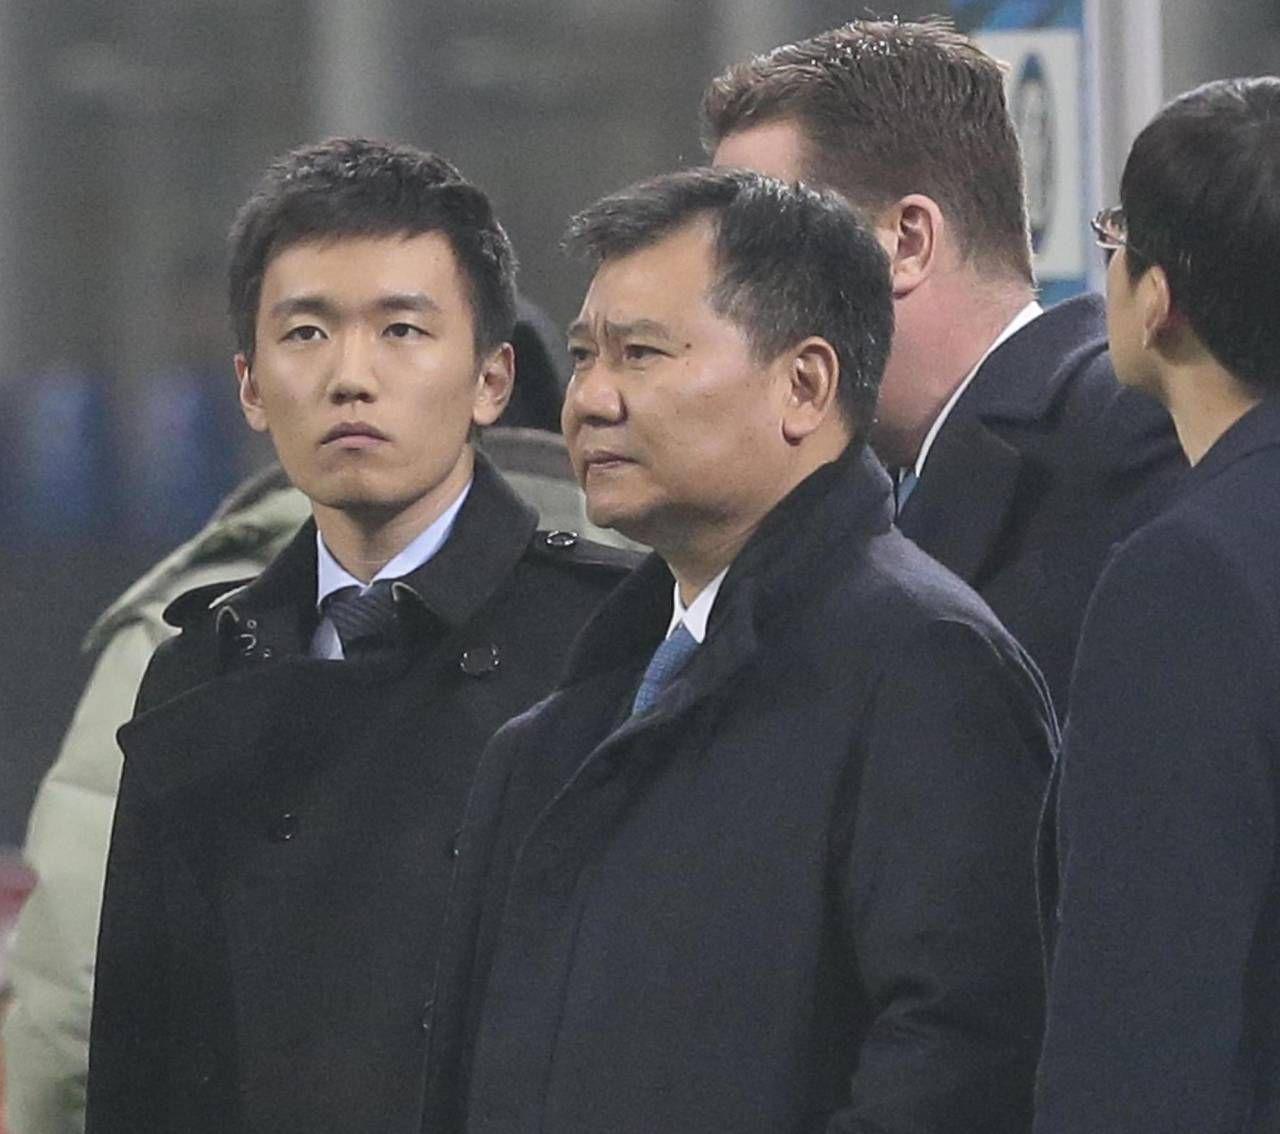 Steven Zhang, 29 anni, n.1 dell'Inter e il padre Zhang Jindong (57), capo di Suning